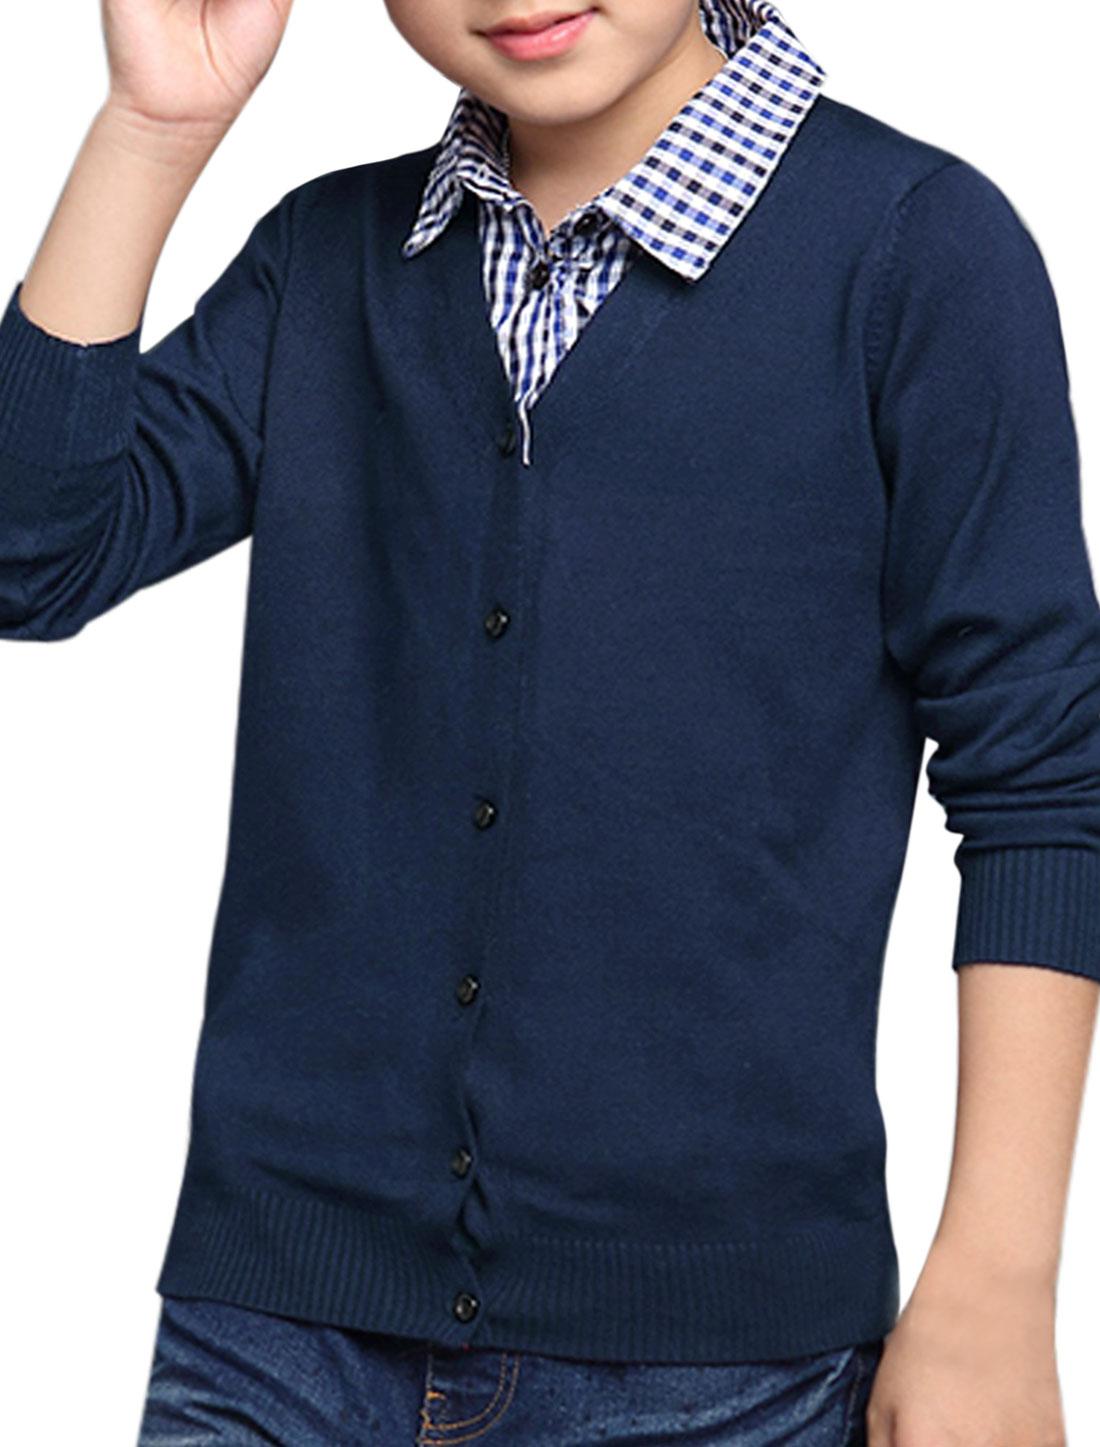 Boys Plaids Point Collar Button Up Layered Knit Top Blue 16